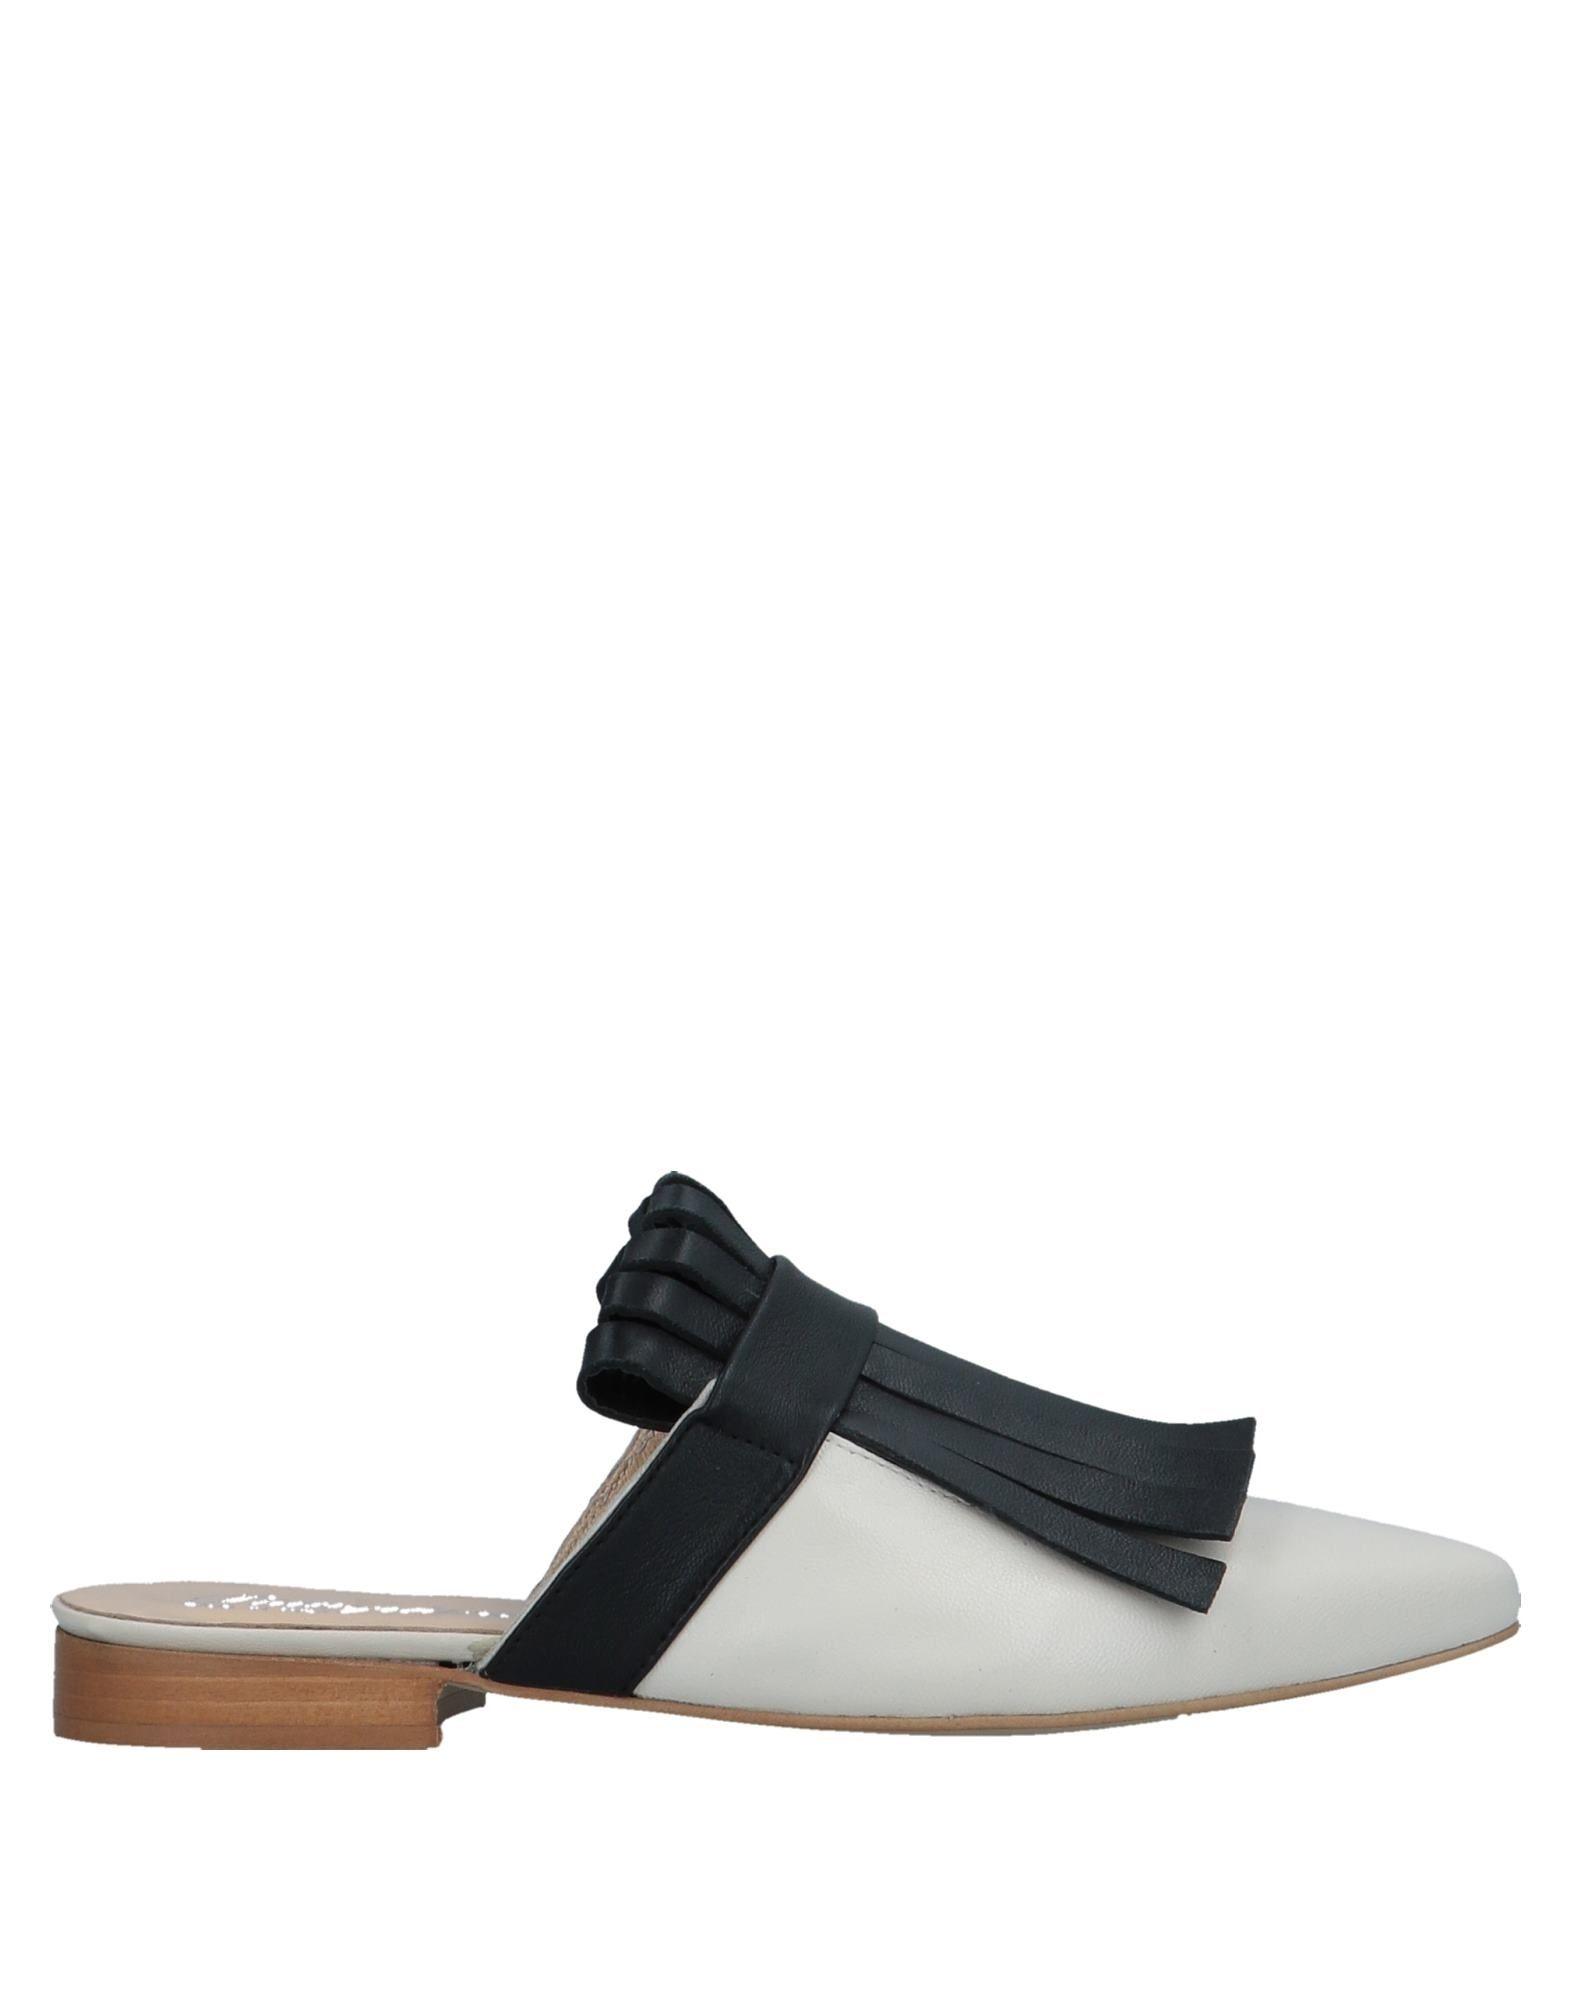 Piampiani Pantoletten Damen  11571302RC Schuhe Gute Qualität beliebte Schuhe 11571302RC b872c7